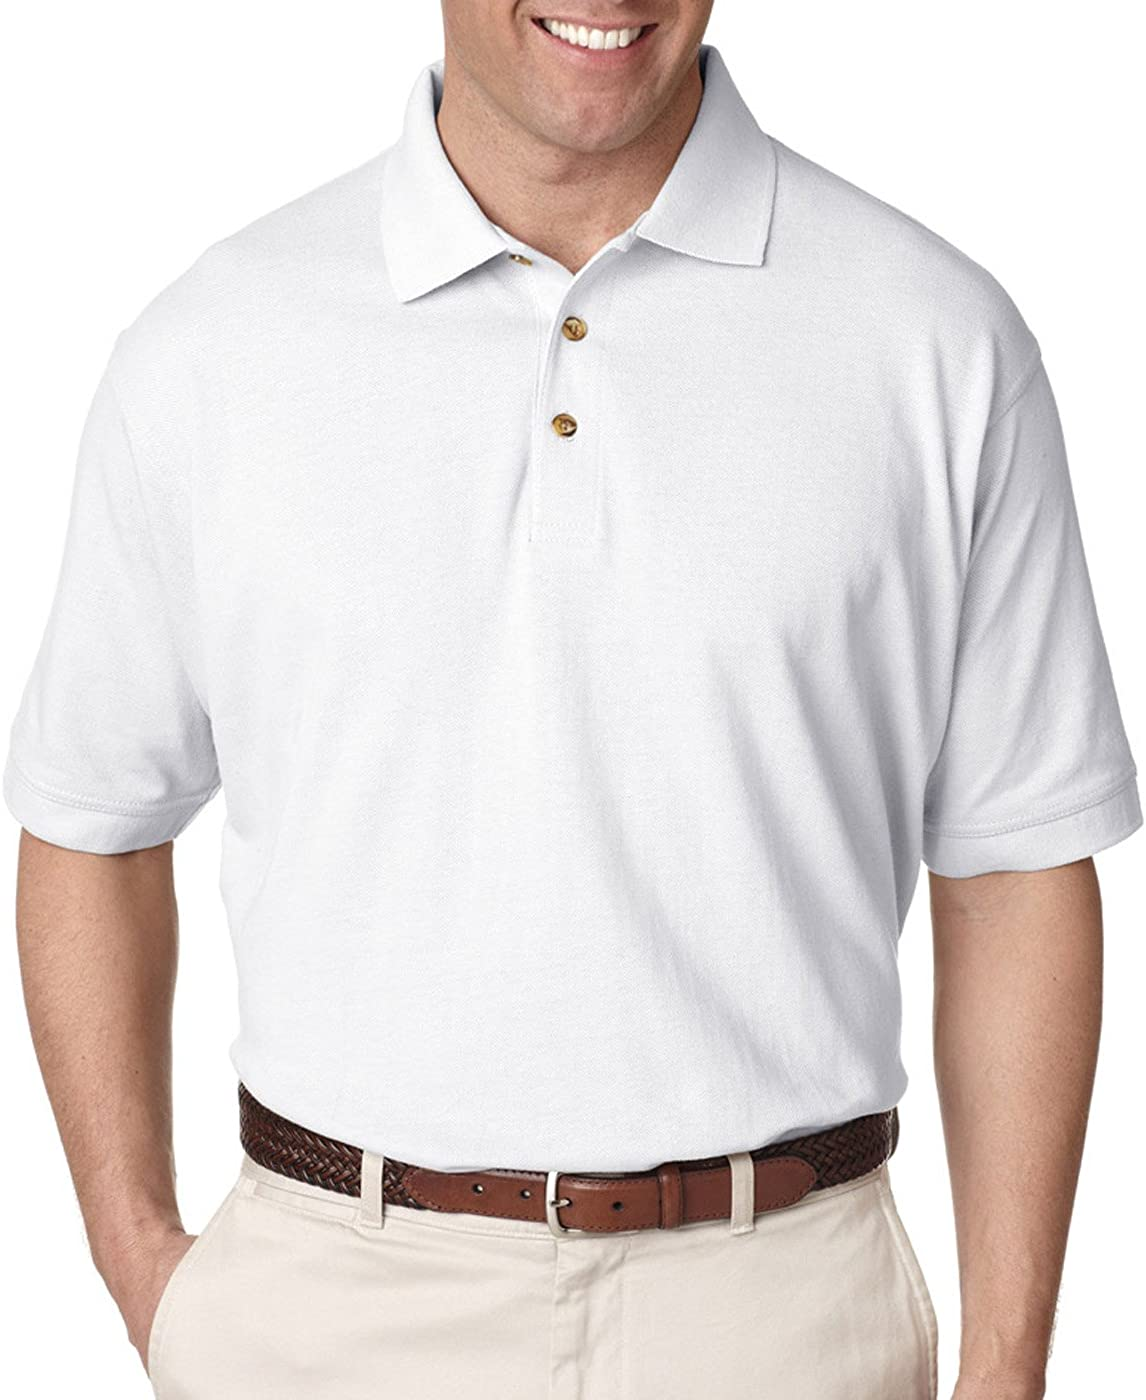 UltraClub Mens Tall Classic Piqué Polo (8535T)-White,XLT